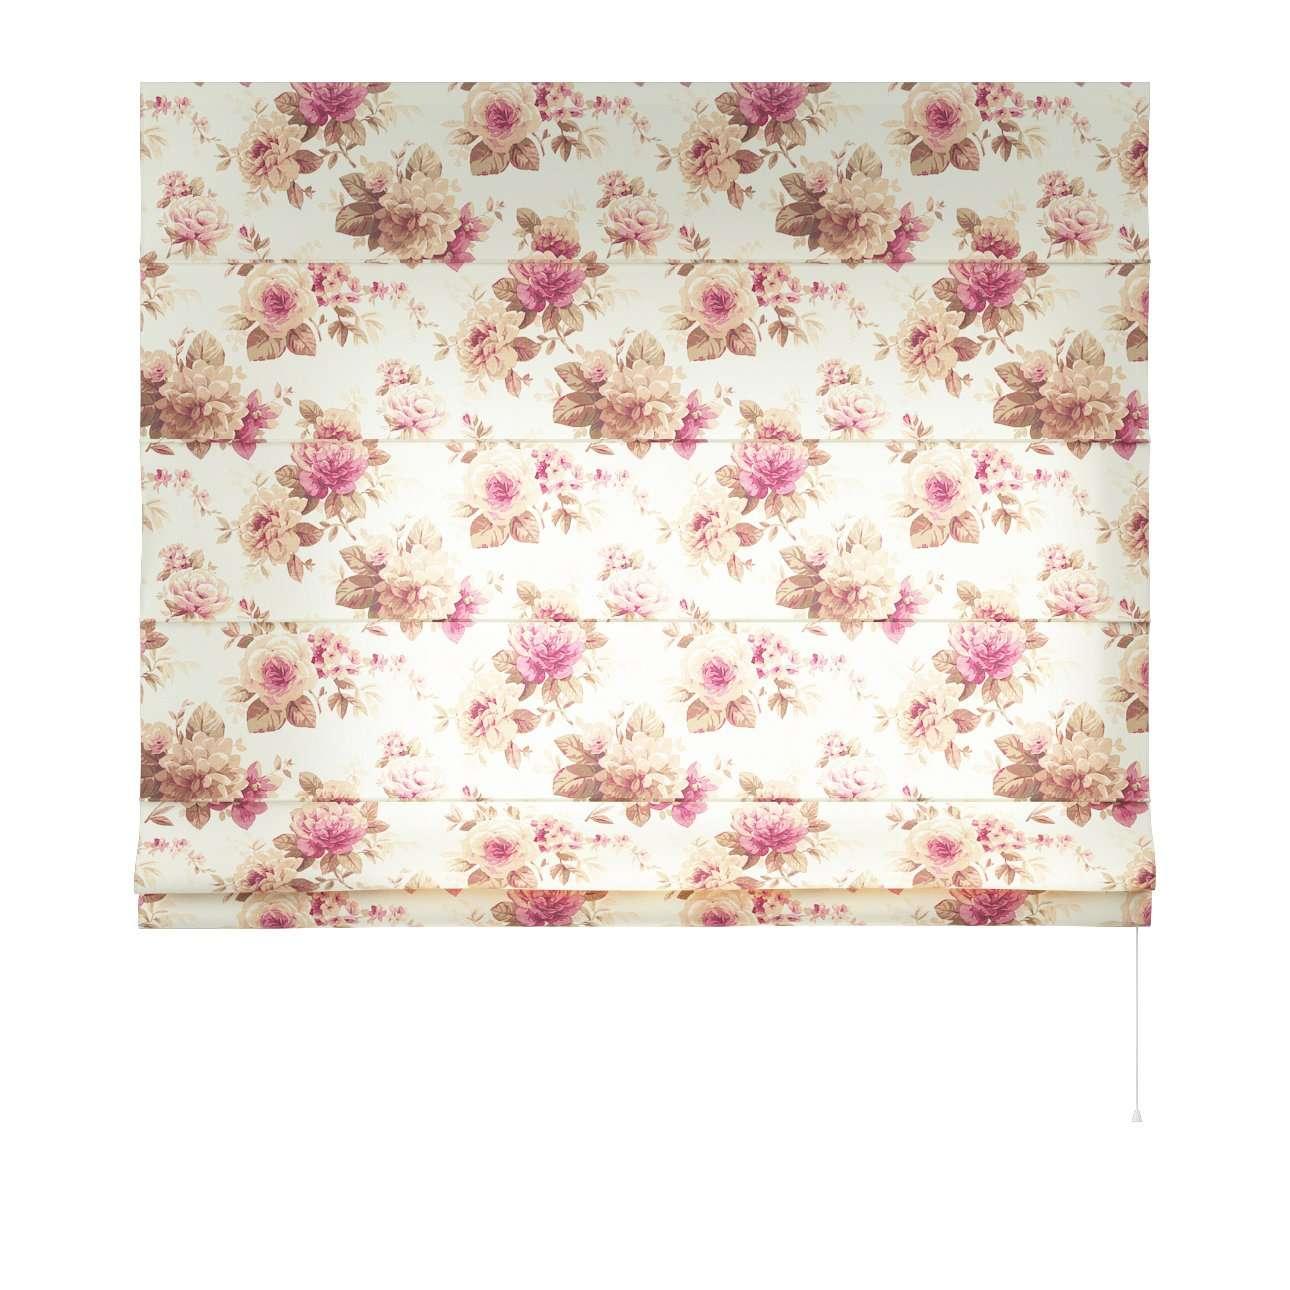 Capri roman blind 80 x 170 cm (31.5 x 67 inch) in collection Mirella, fabric: 141-06